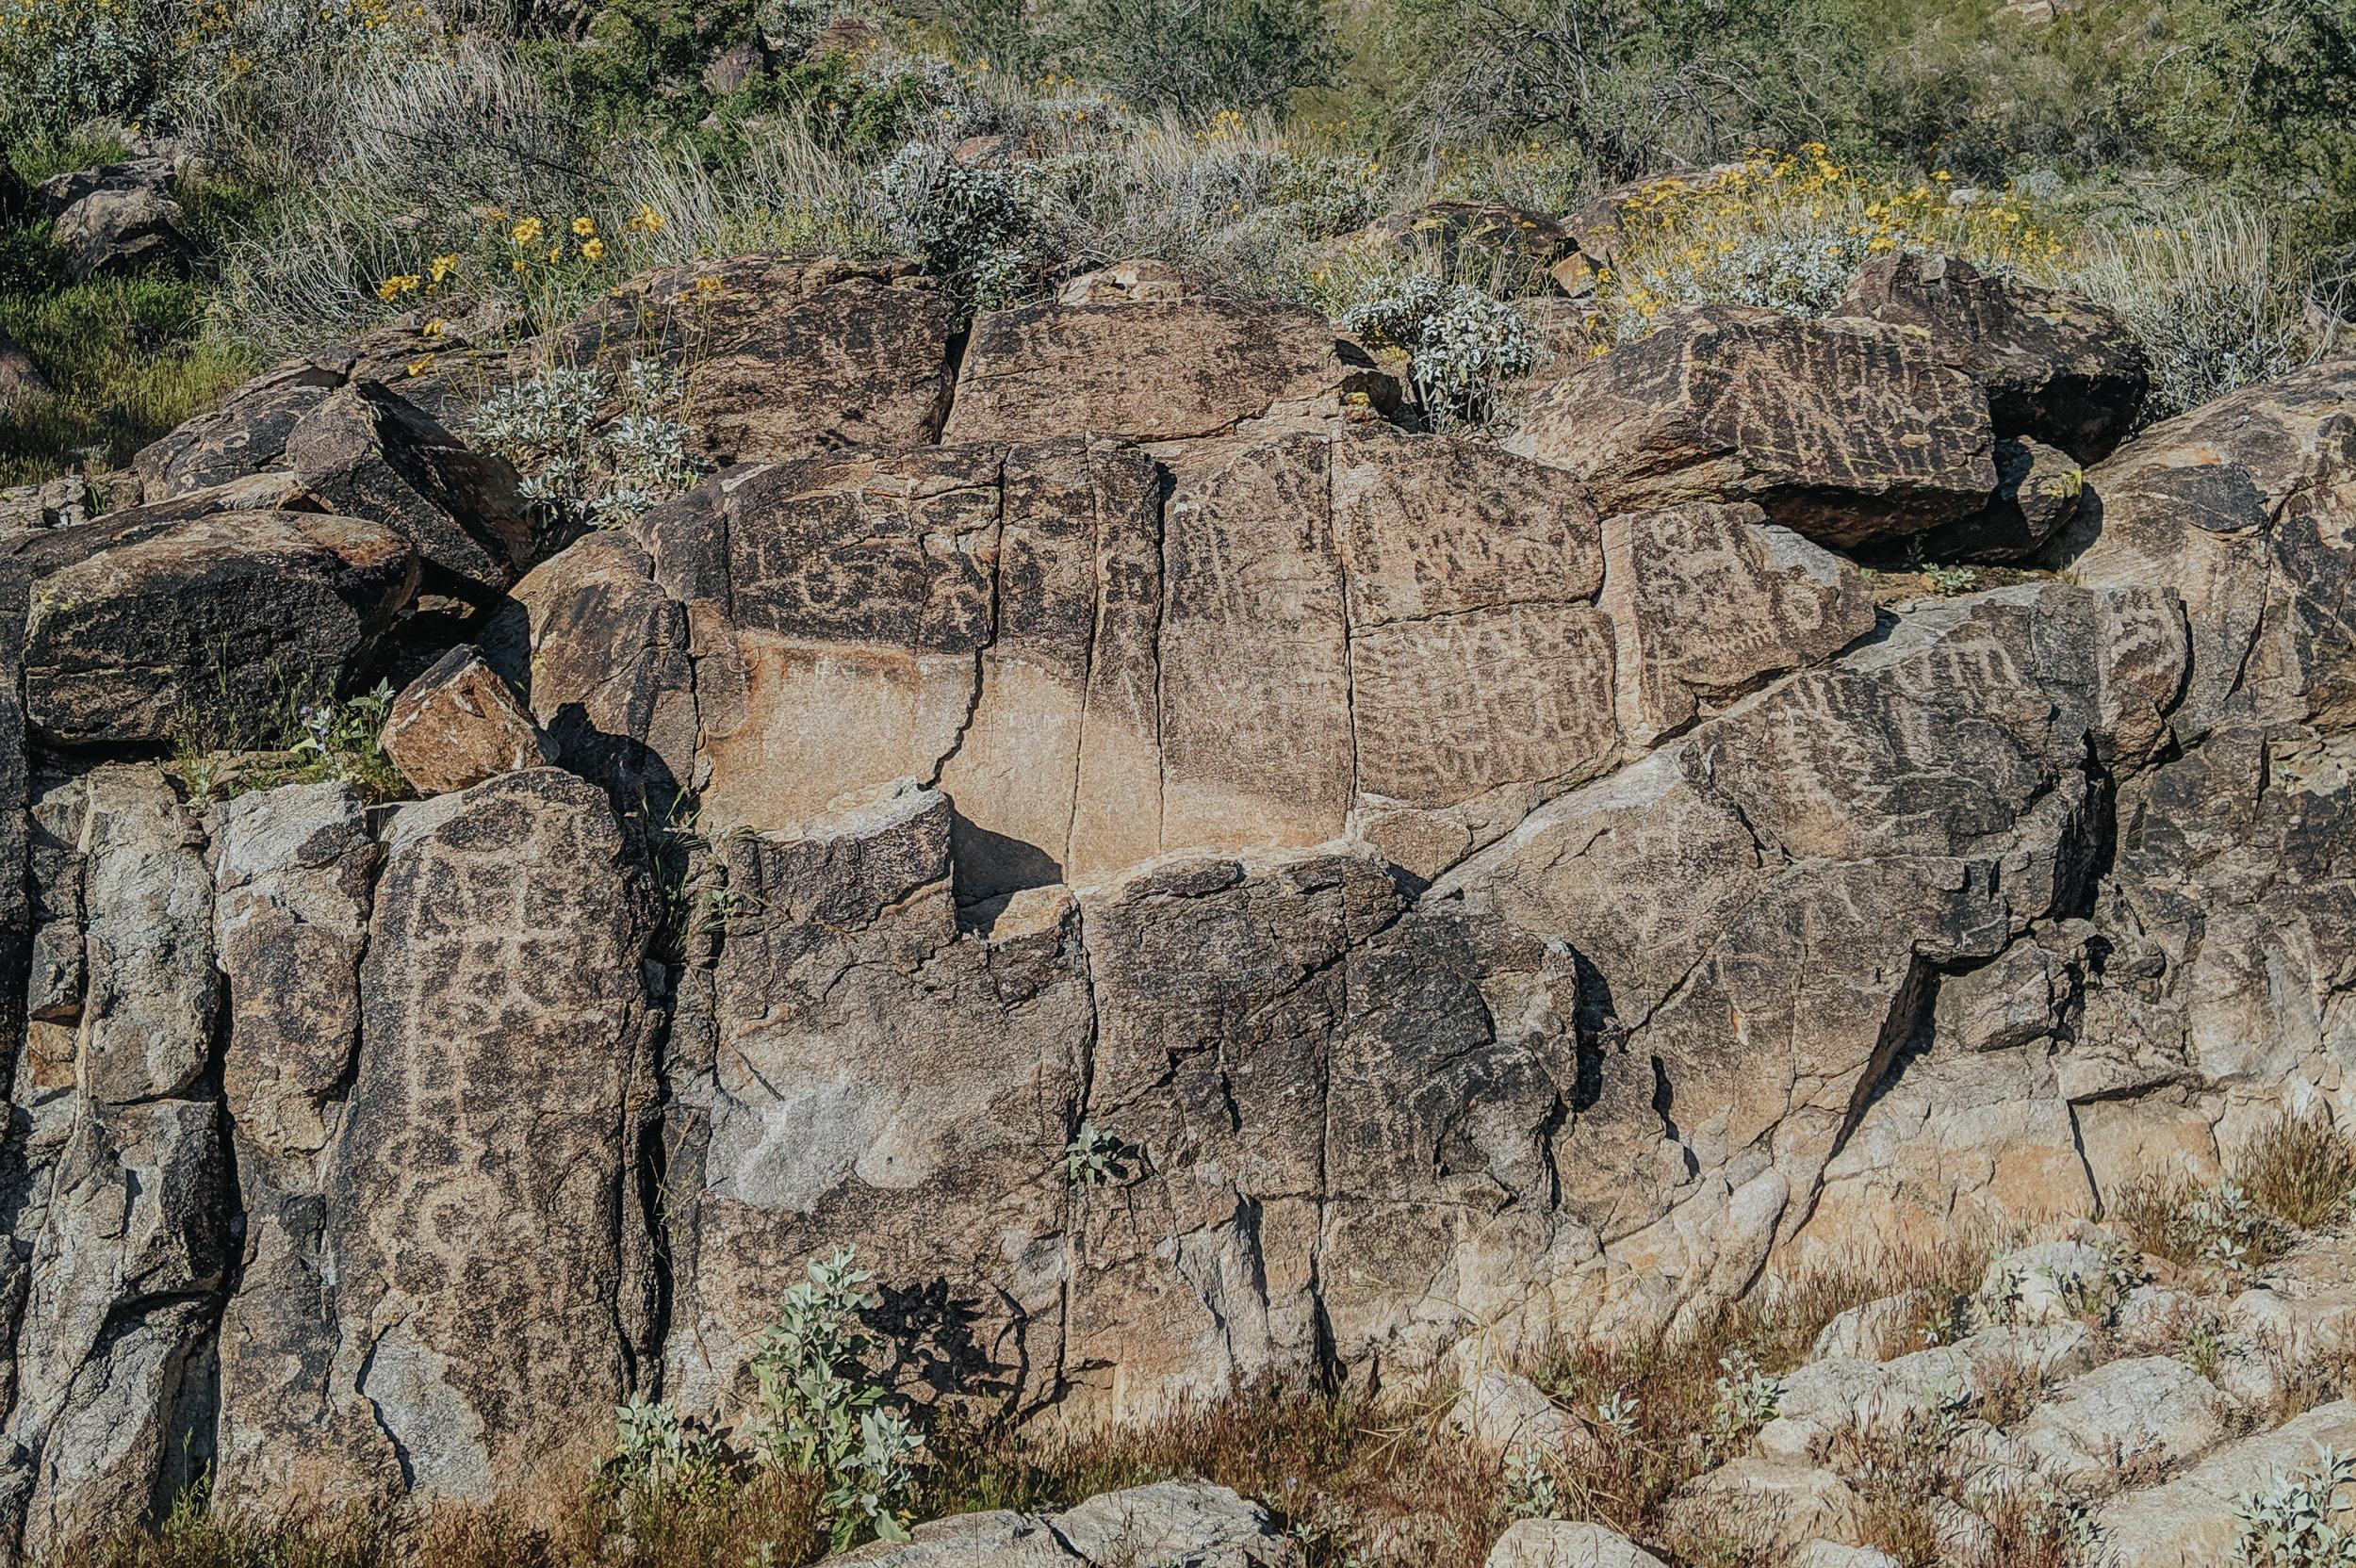 Petroglyphs at White Tank Mountain Regional Park